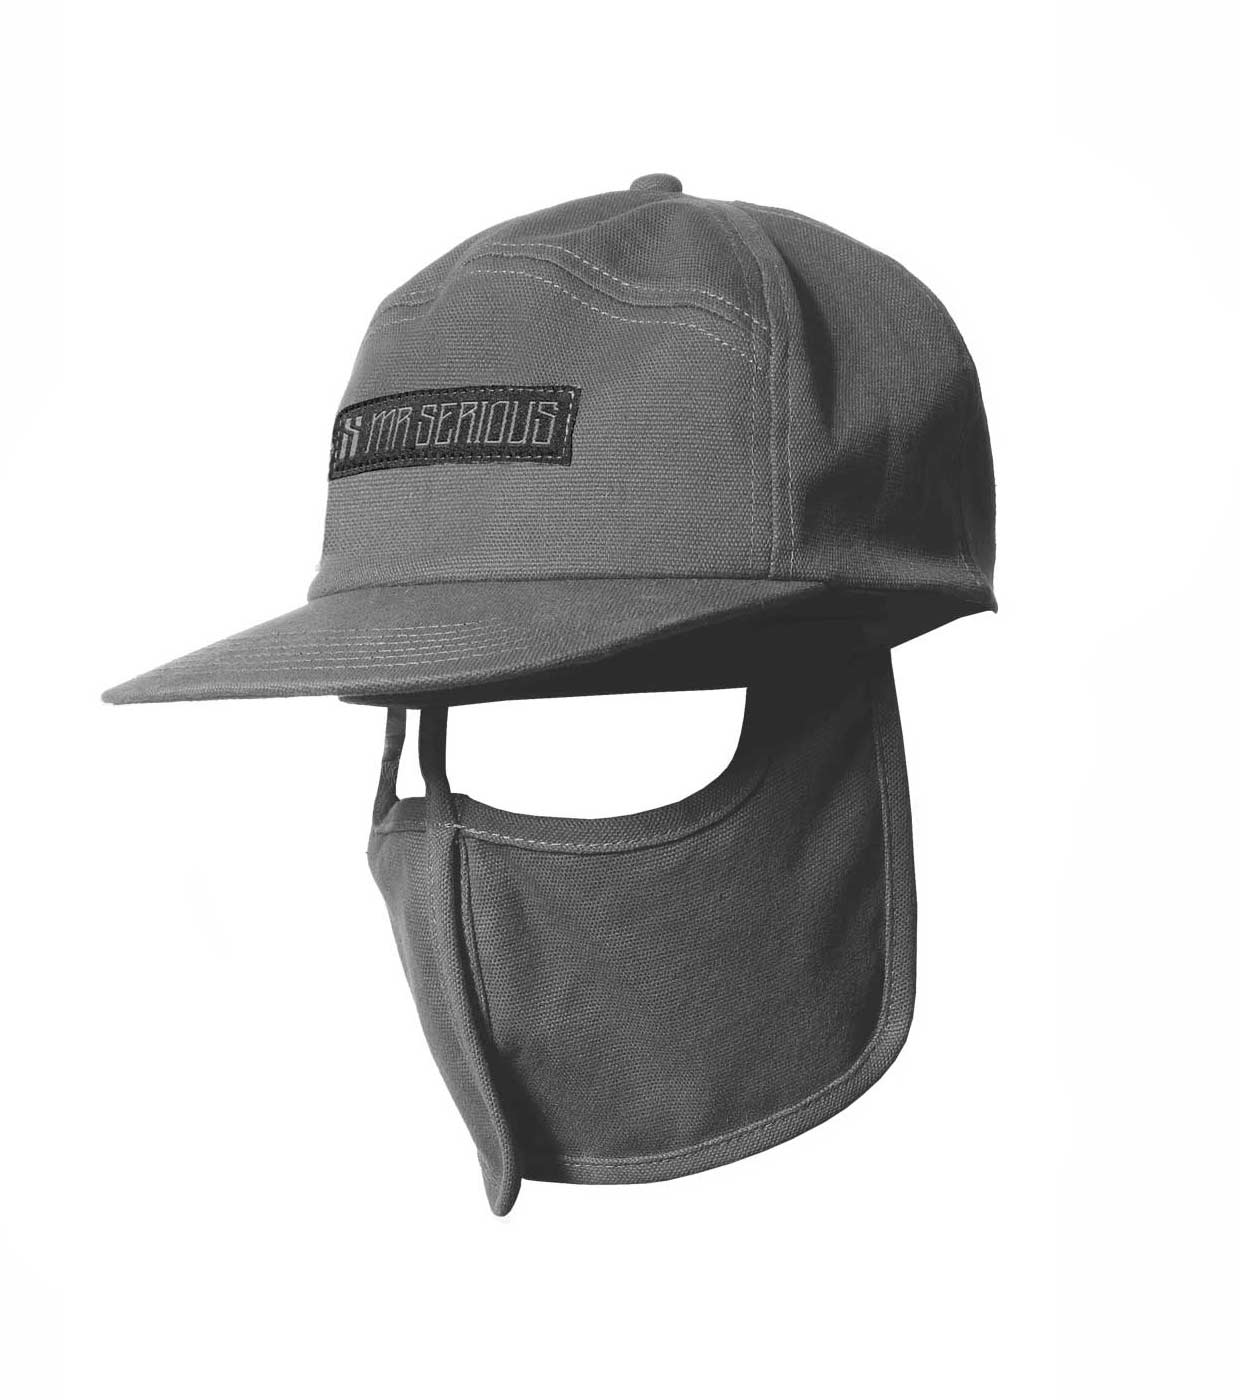 f98e2f877ec Mr Serious Unknown cap grey